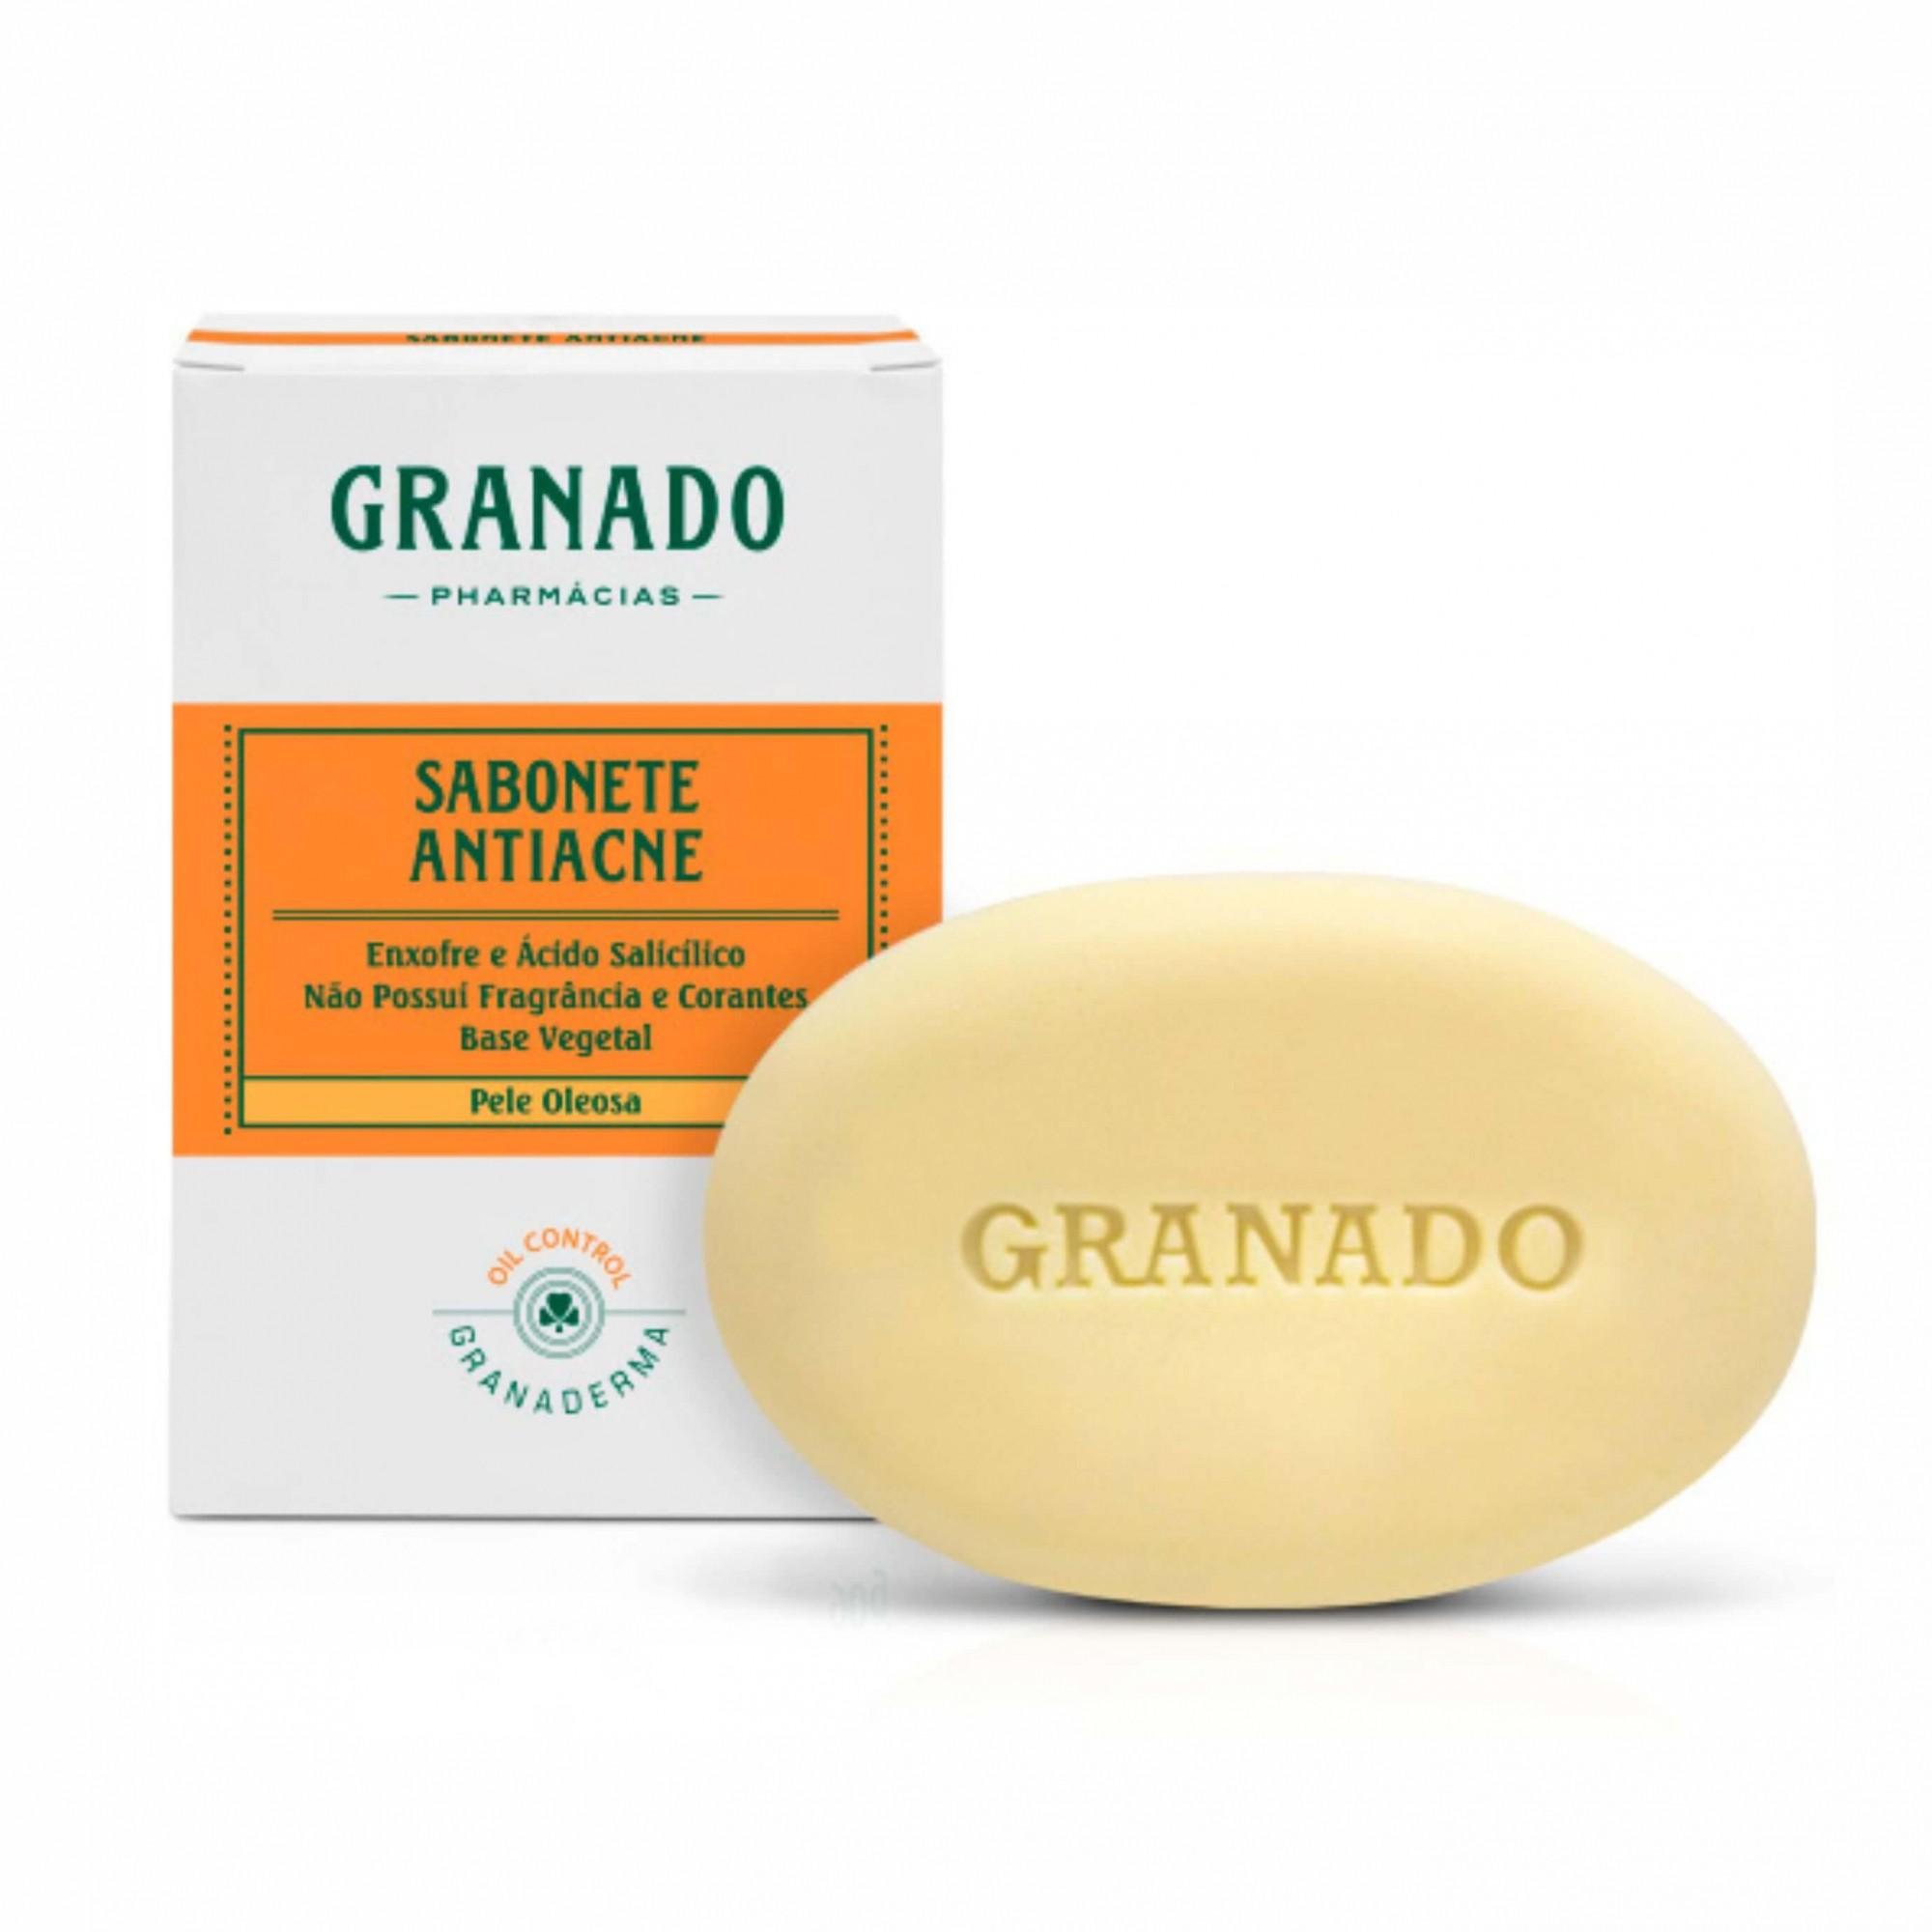 Sabonete Antiacne 90g